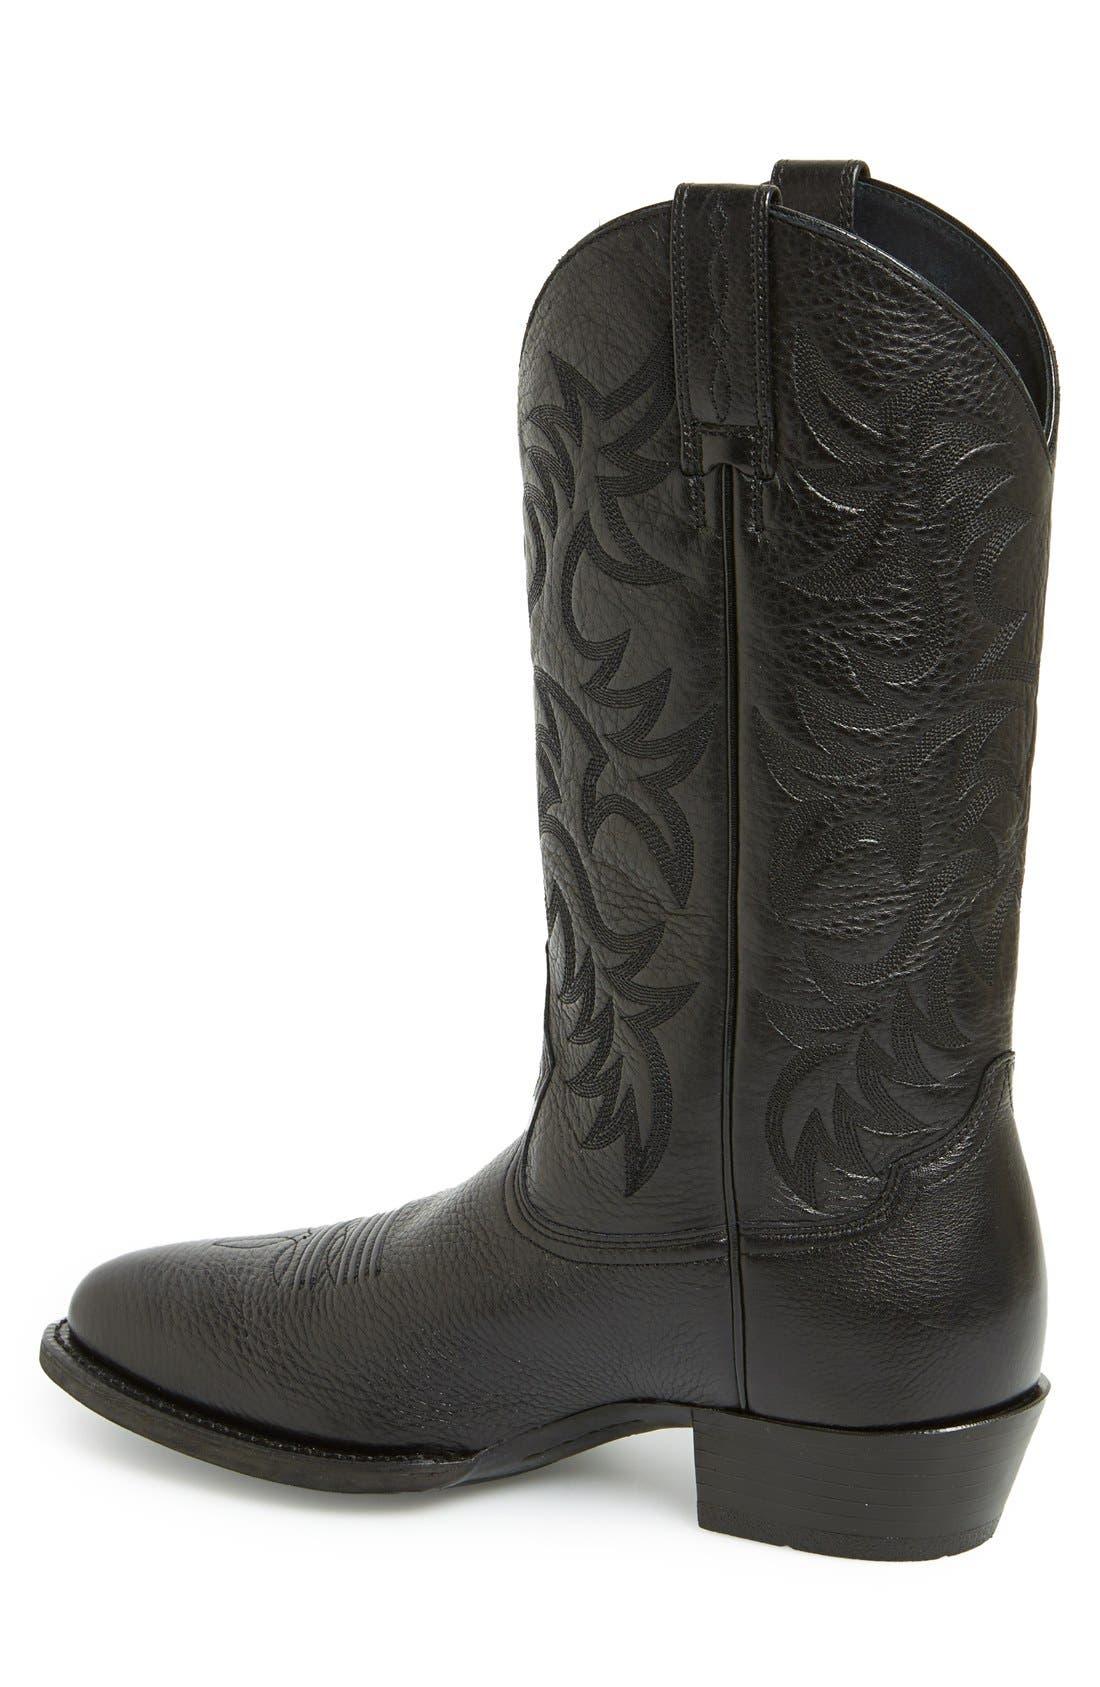 ARIAT, 'Heritage' Leather Cowboy R-Toe Boot, Alternate thumbnail 2, color, BLACK DEERTAN